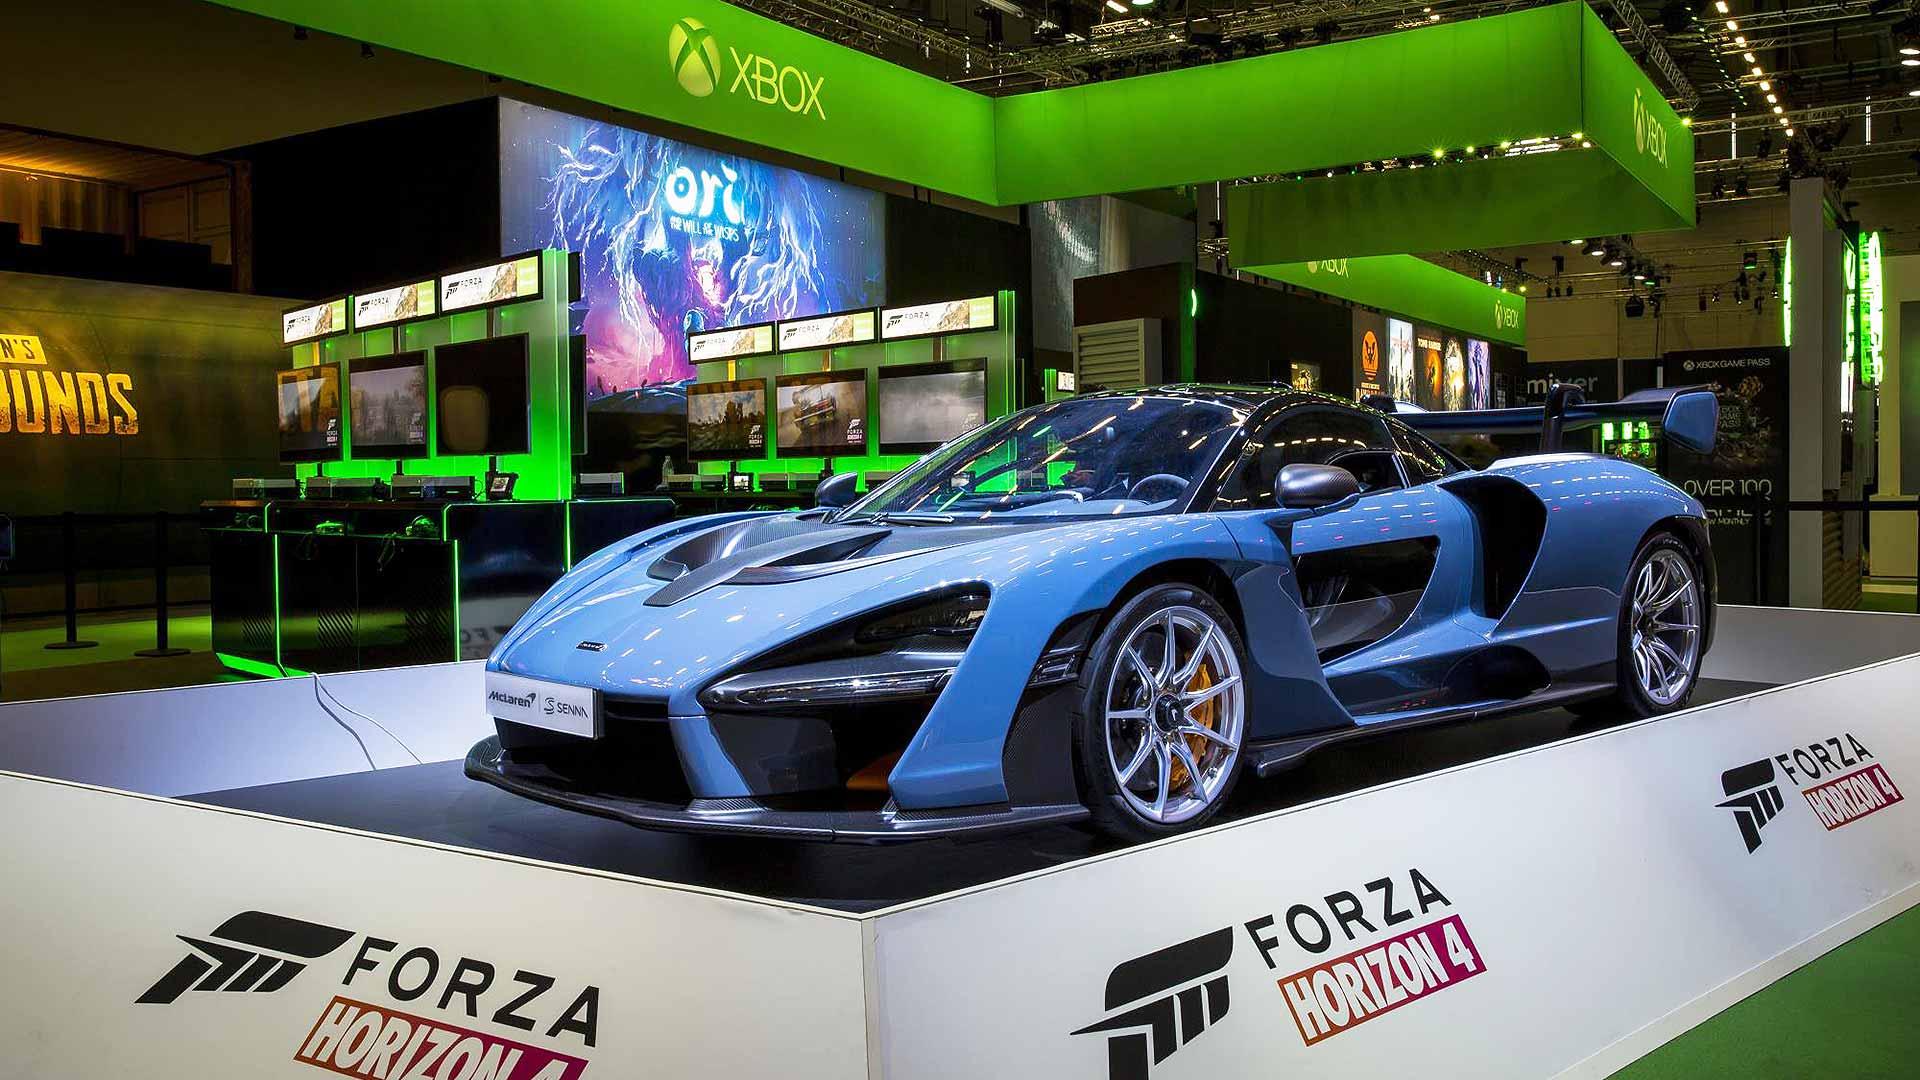 McLaren Senna in Forza Horizon 4 Xbox video game